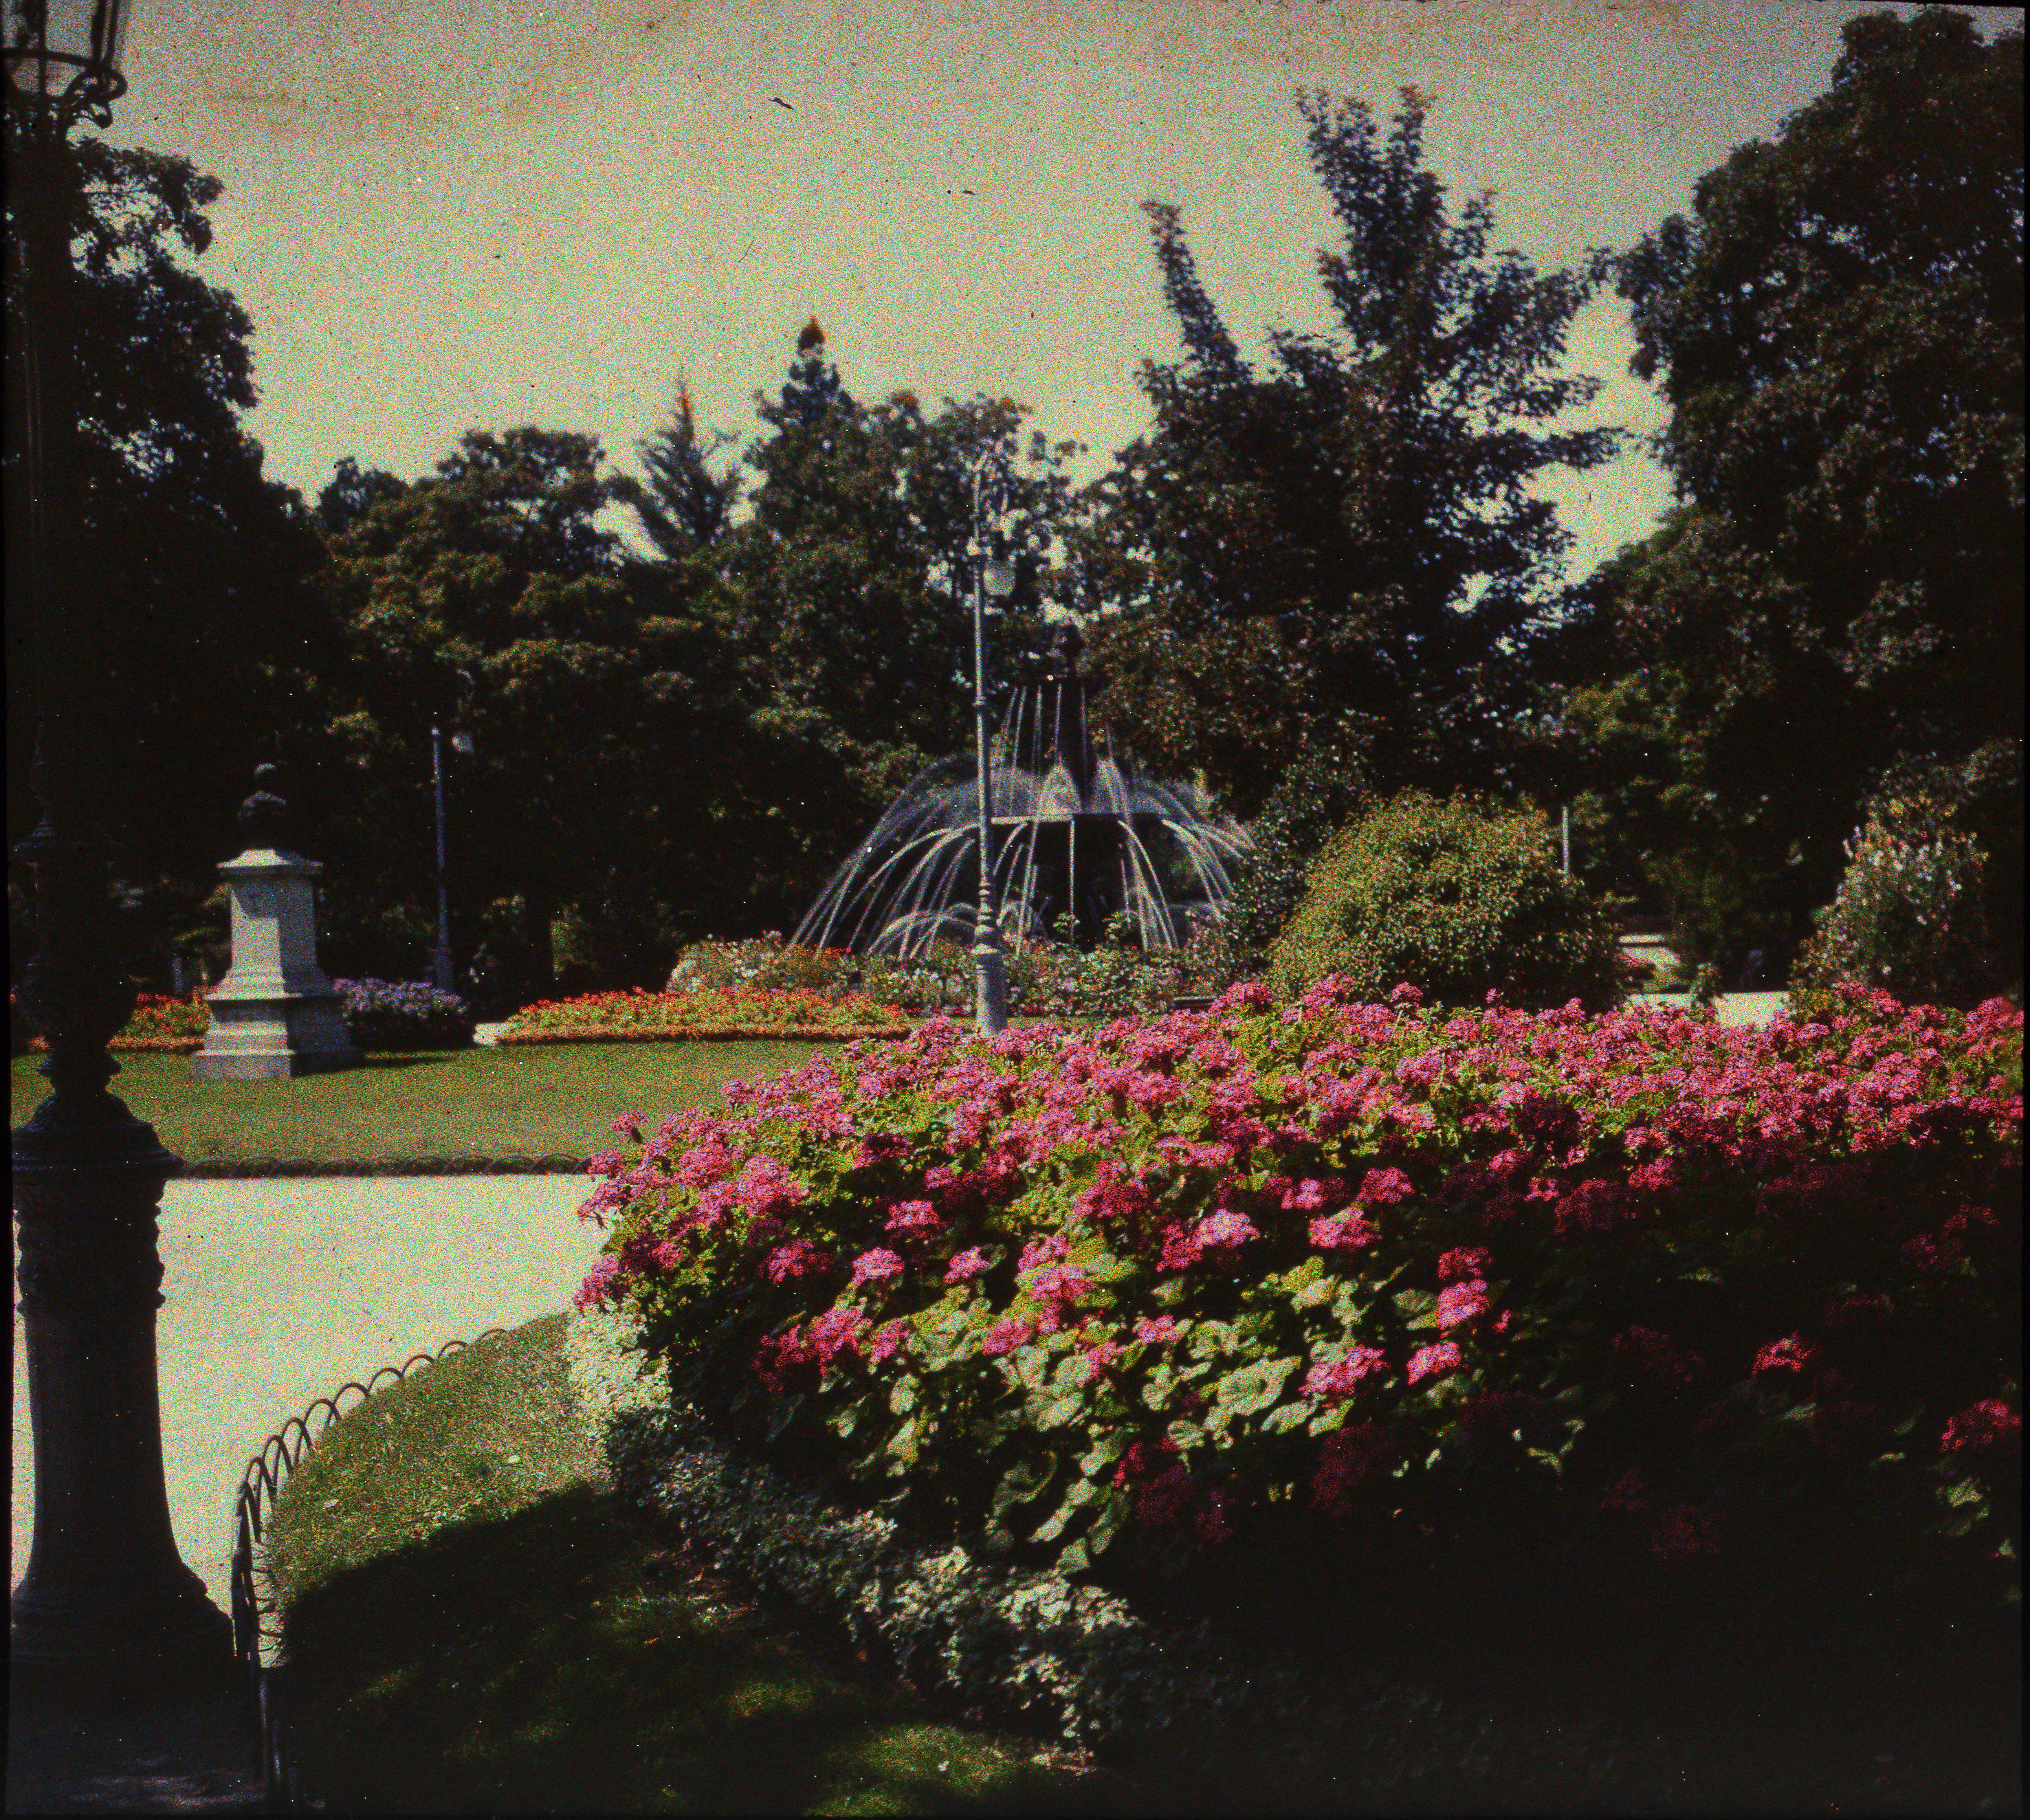 Gen ve jardin anglais notre histoire for Jardin anglais geneve programme